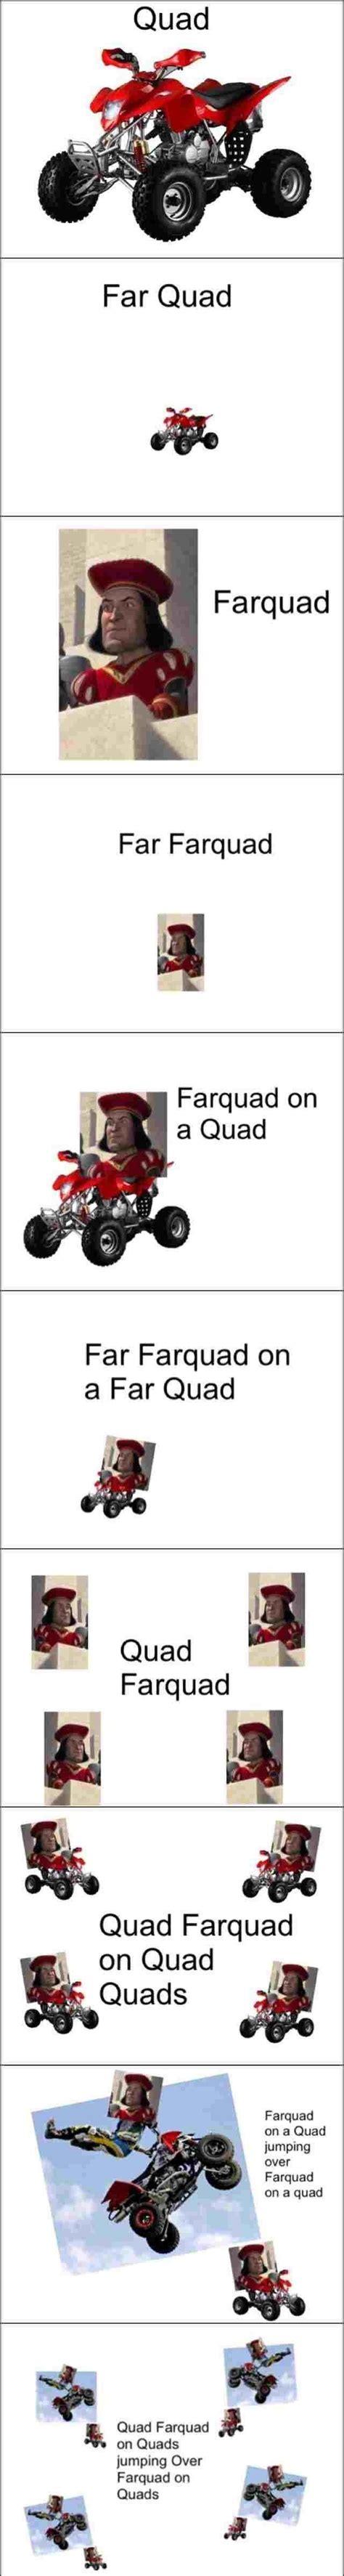 Quad Memes - lord farquad is an idiot lol humor pinterest jokes quad and dr seuss